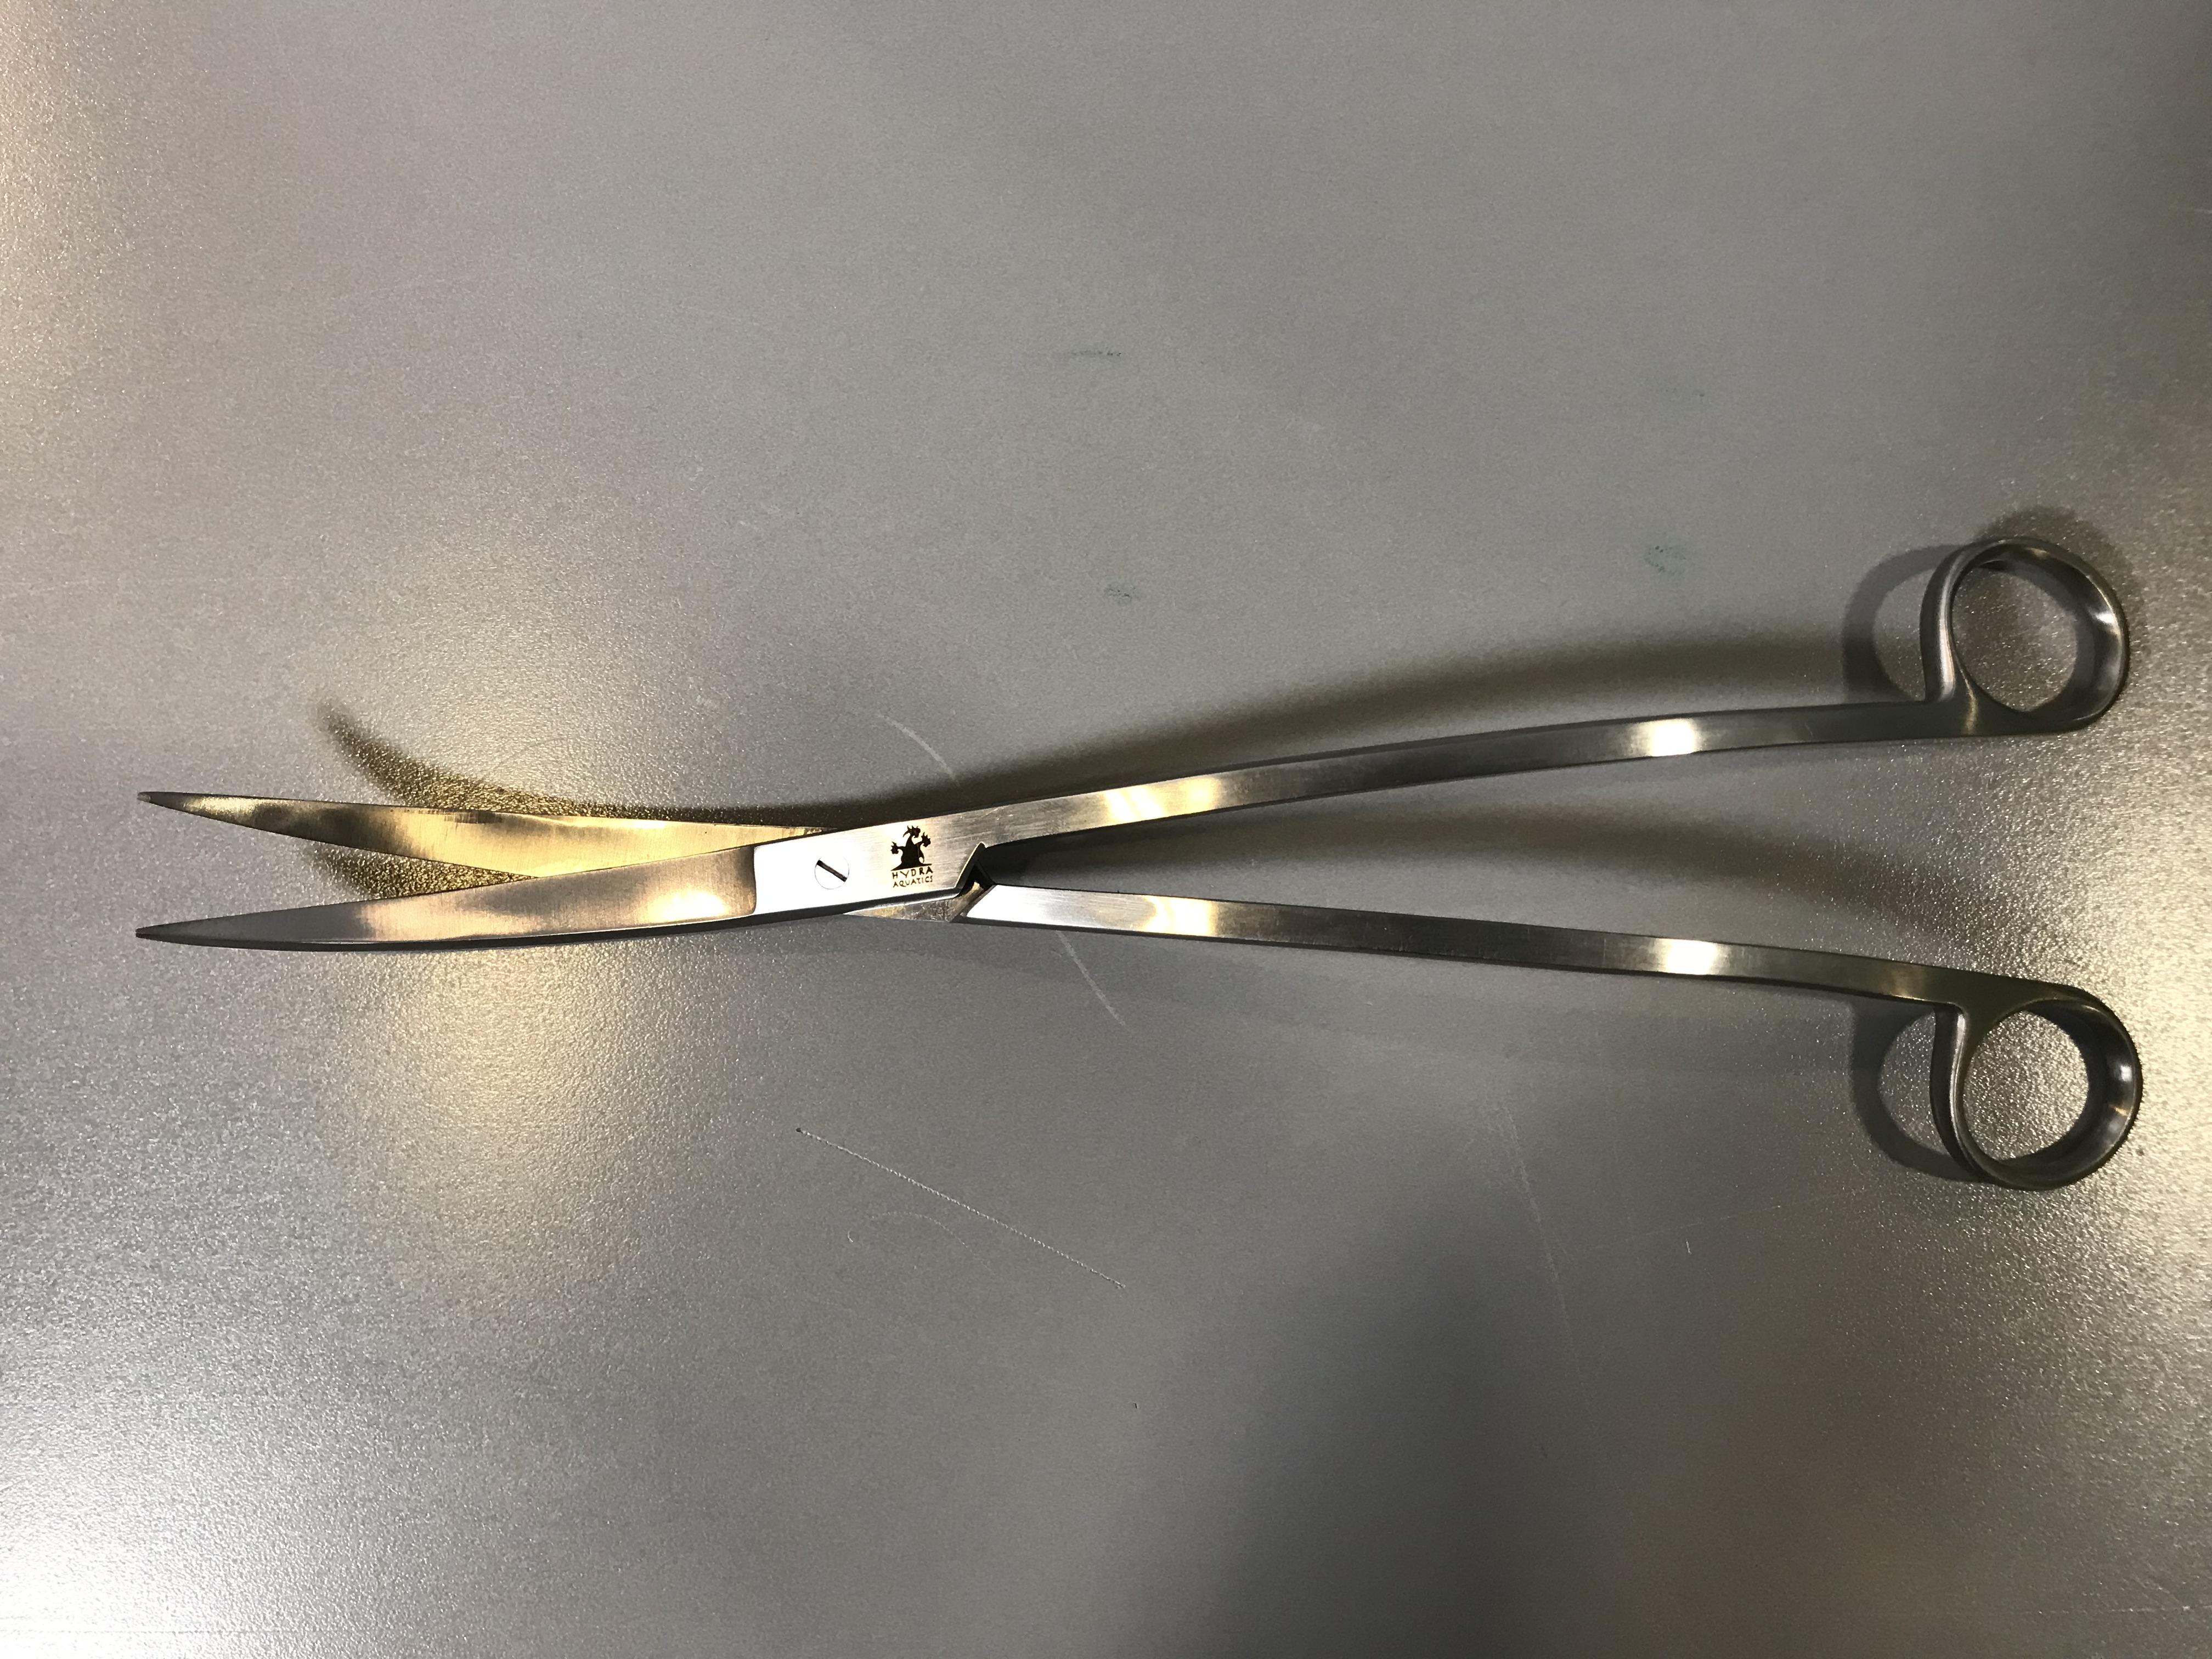 Wave Scissors - 10